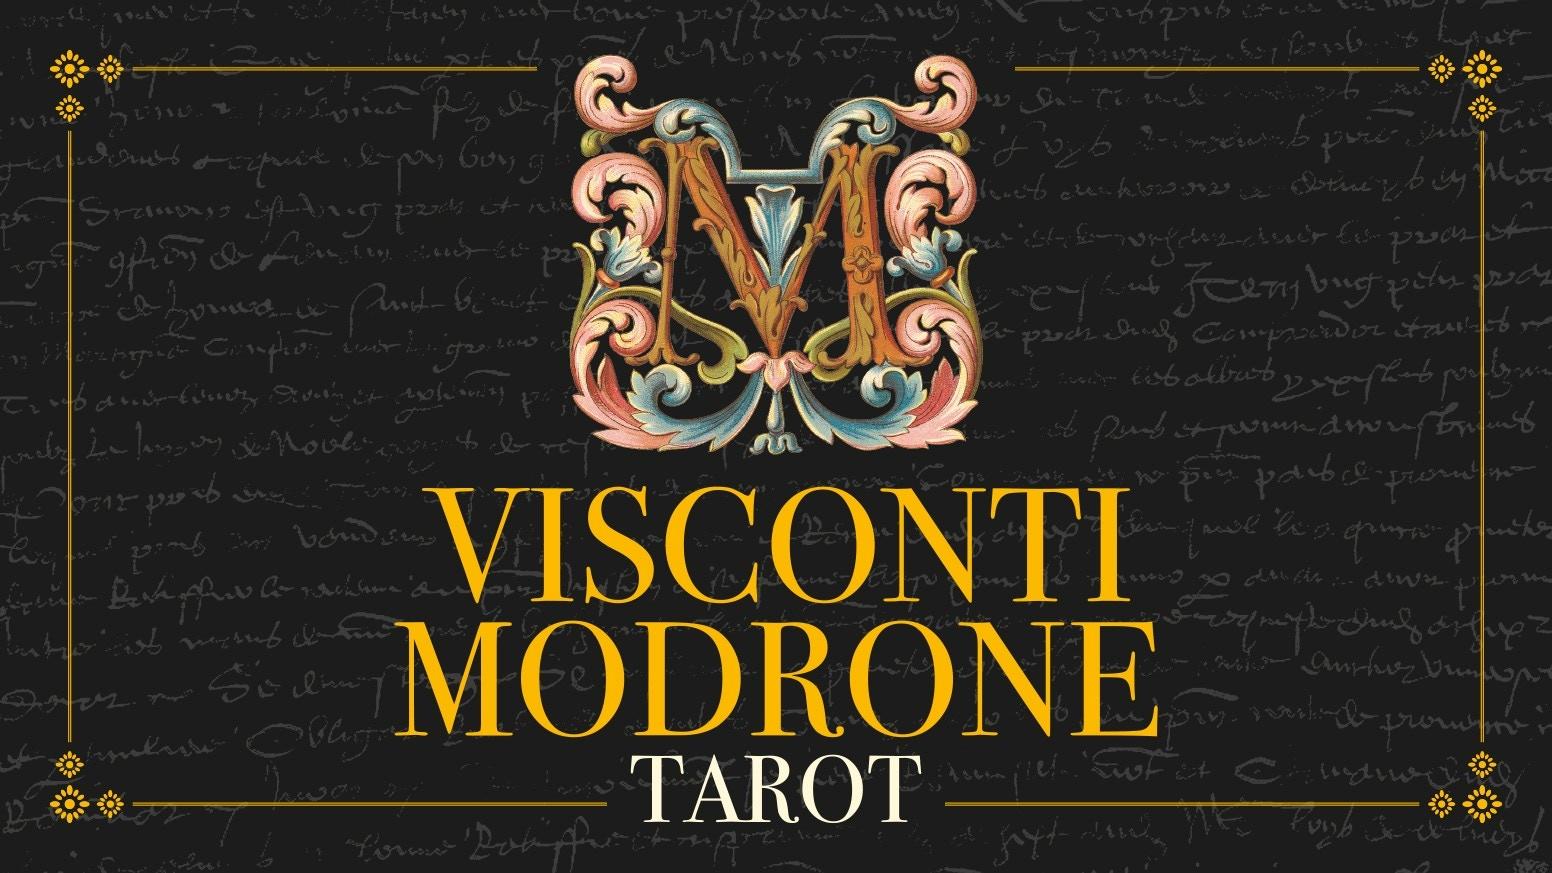 Visconti Modrone Tarot